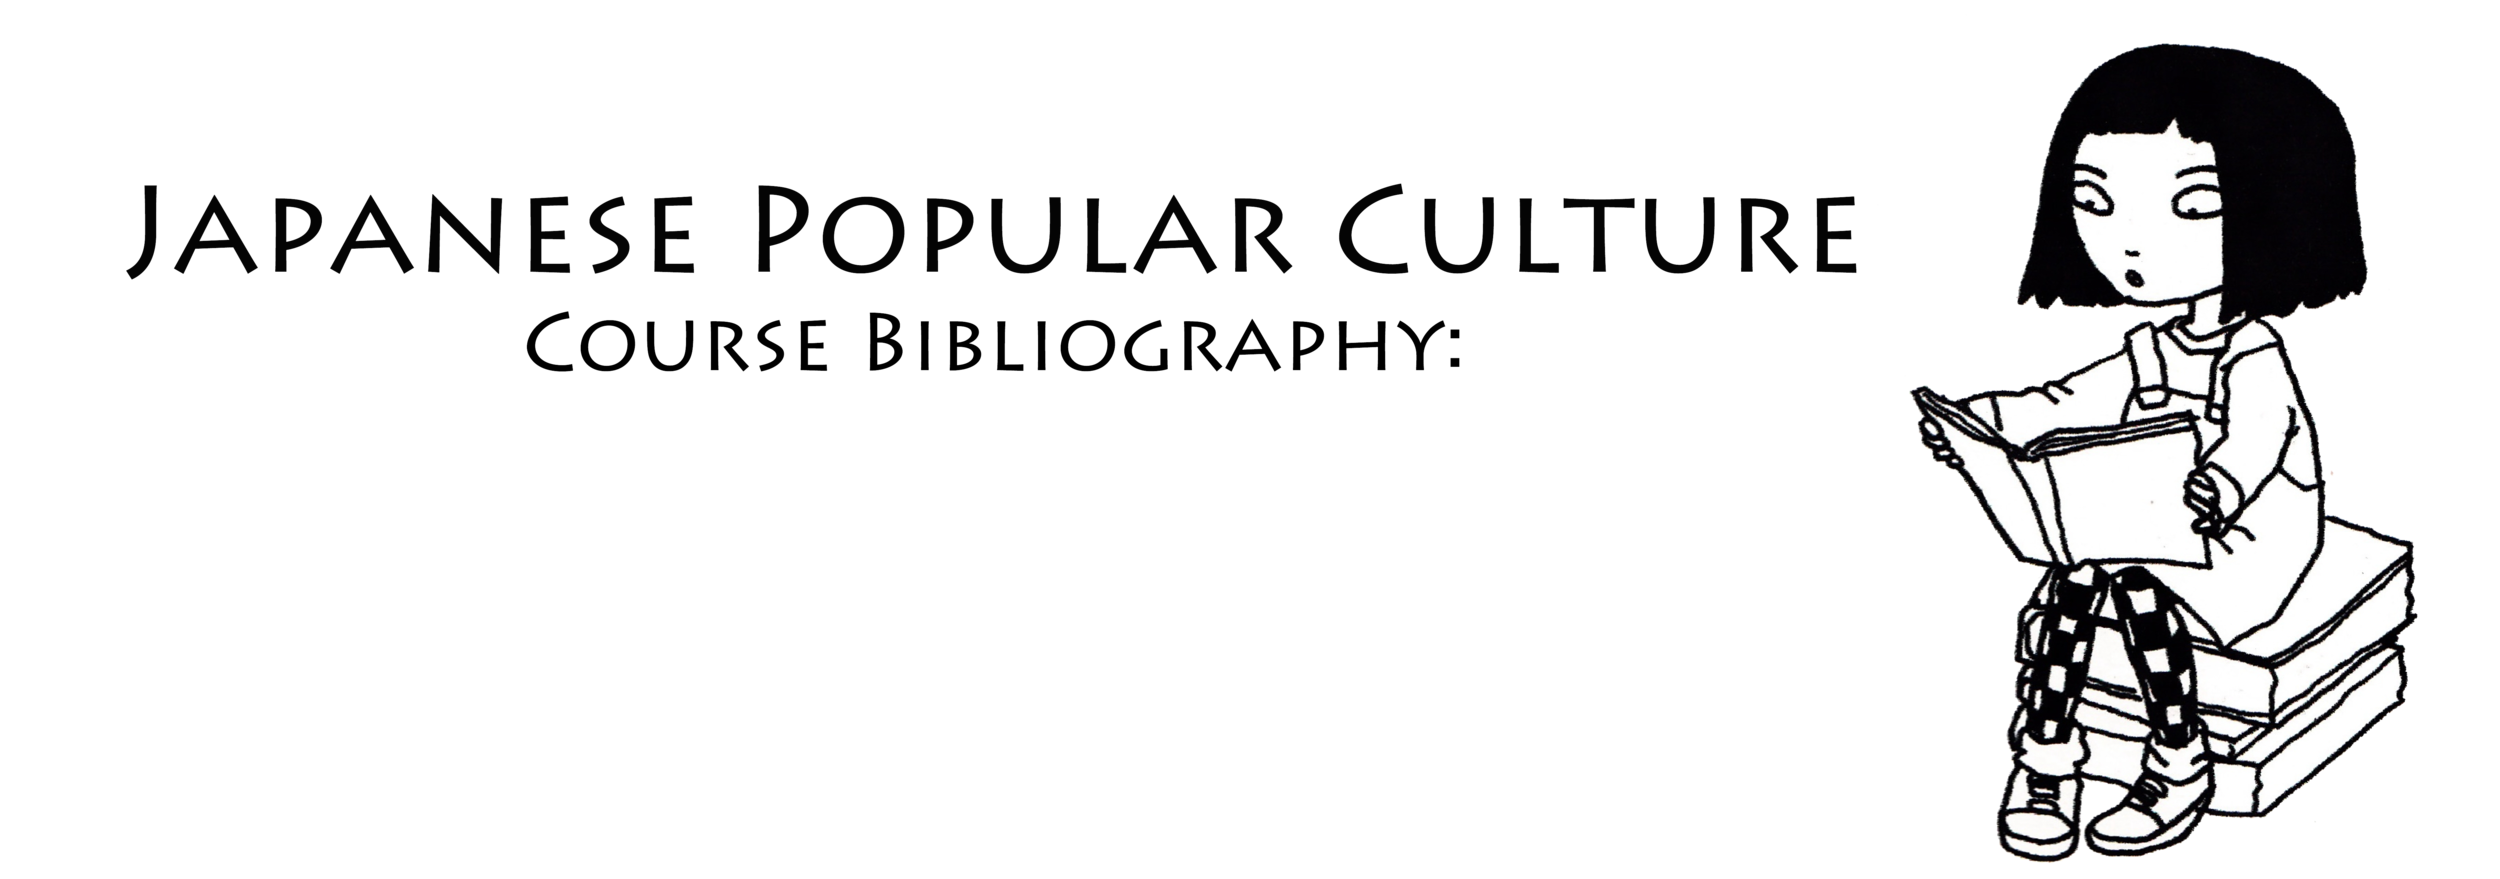 Popular Culture Bibliography title.png